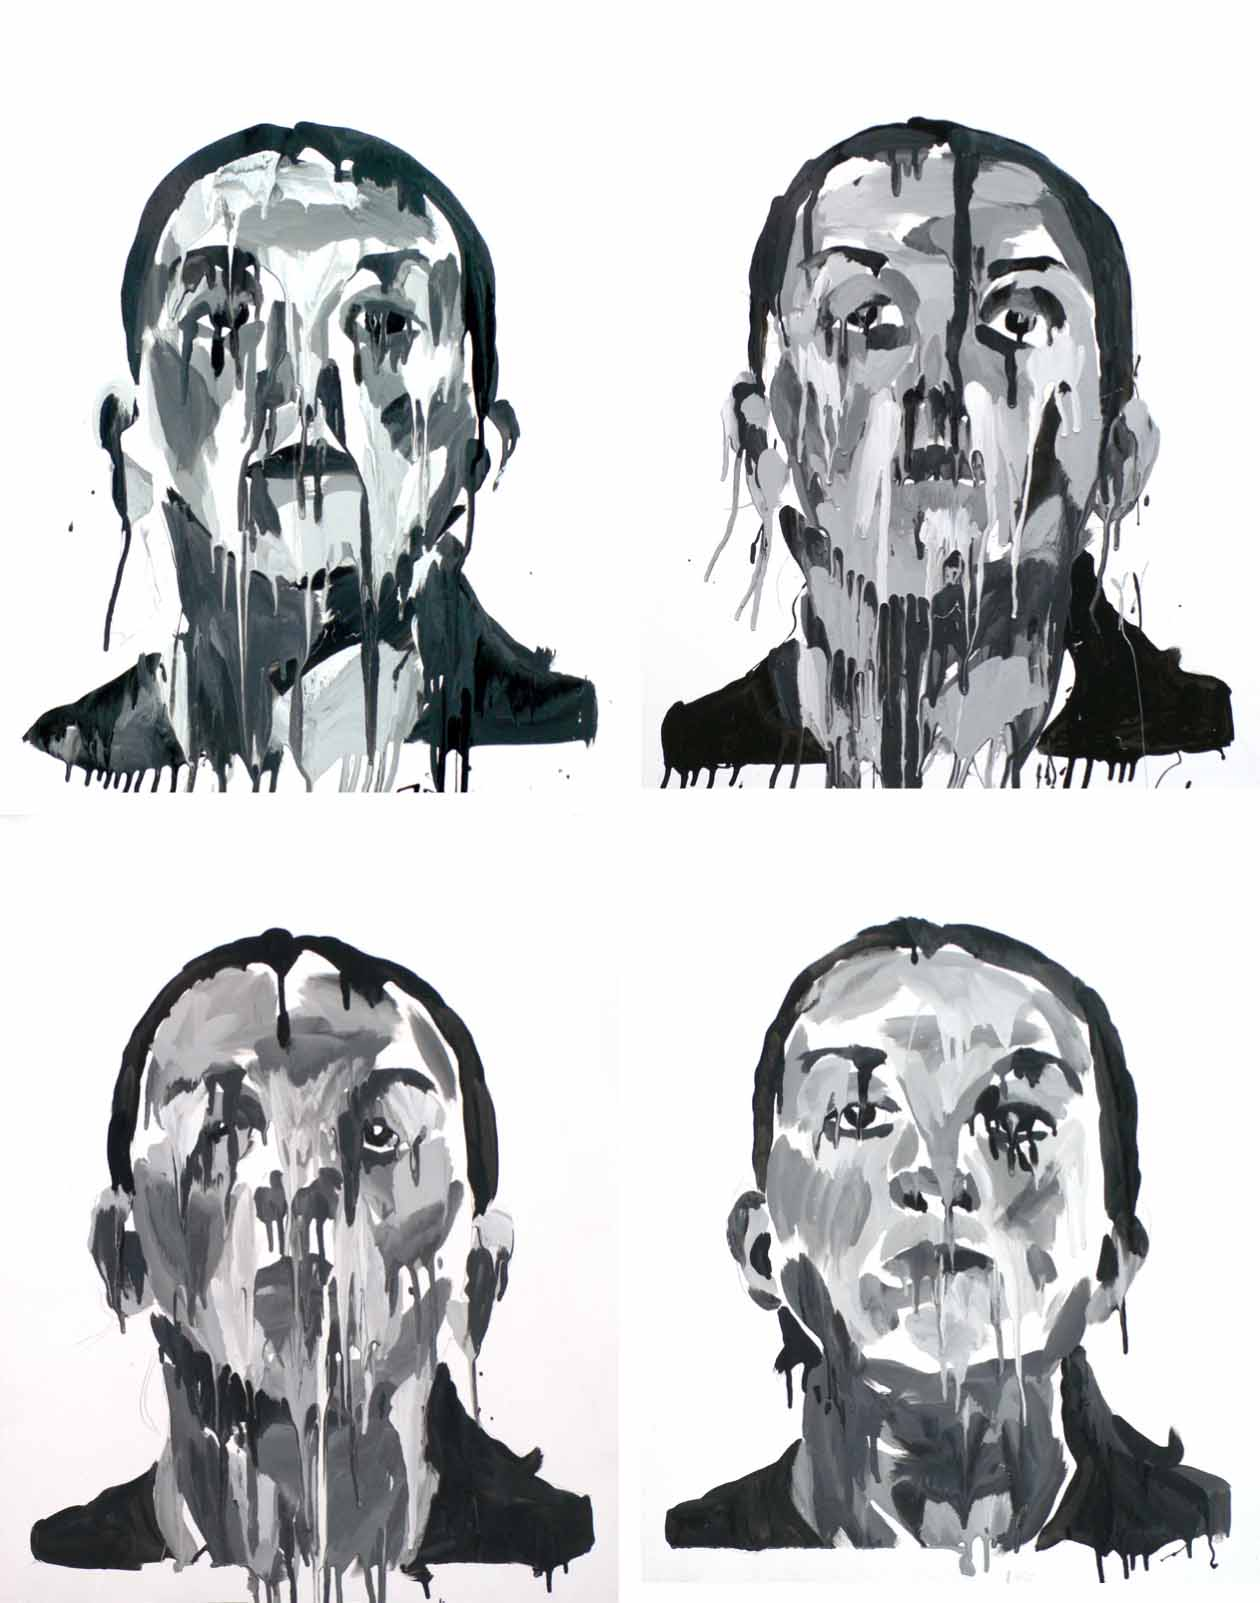 Sassoon Passport Self-portraits #1-4